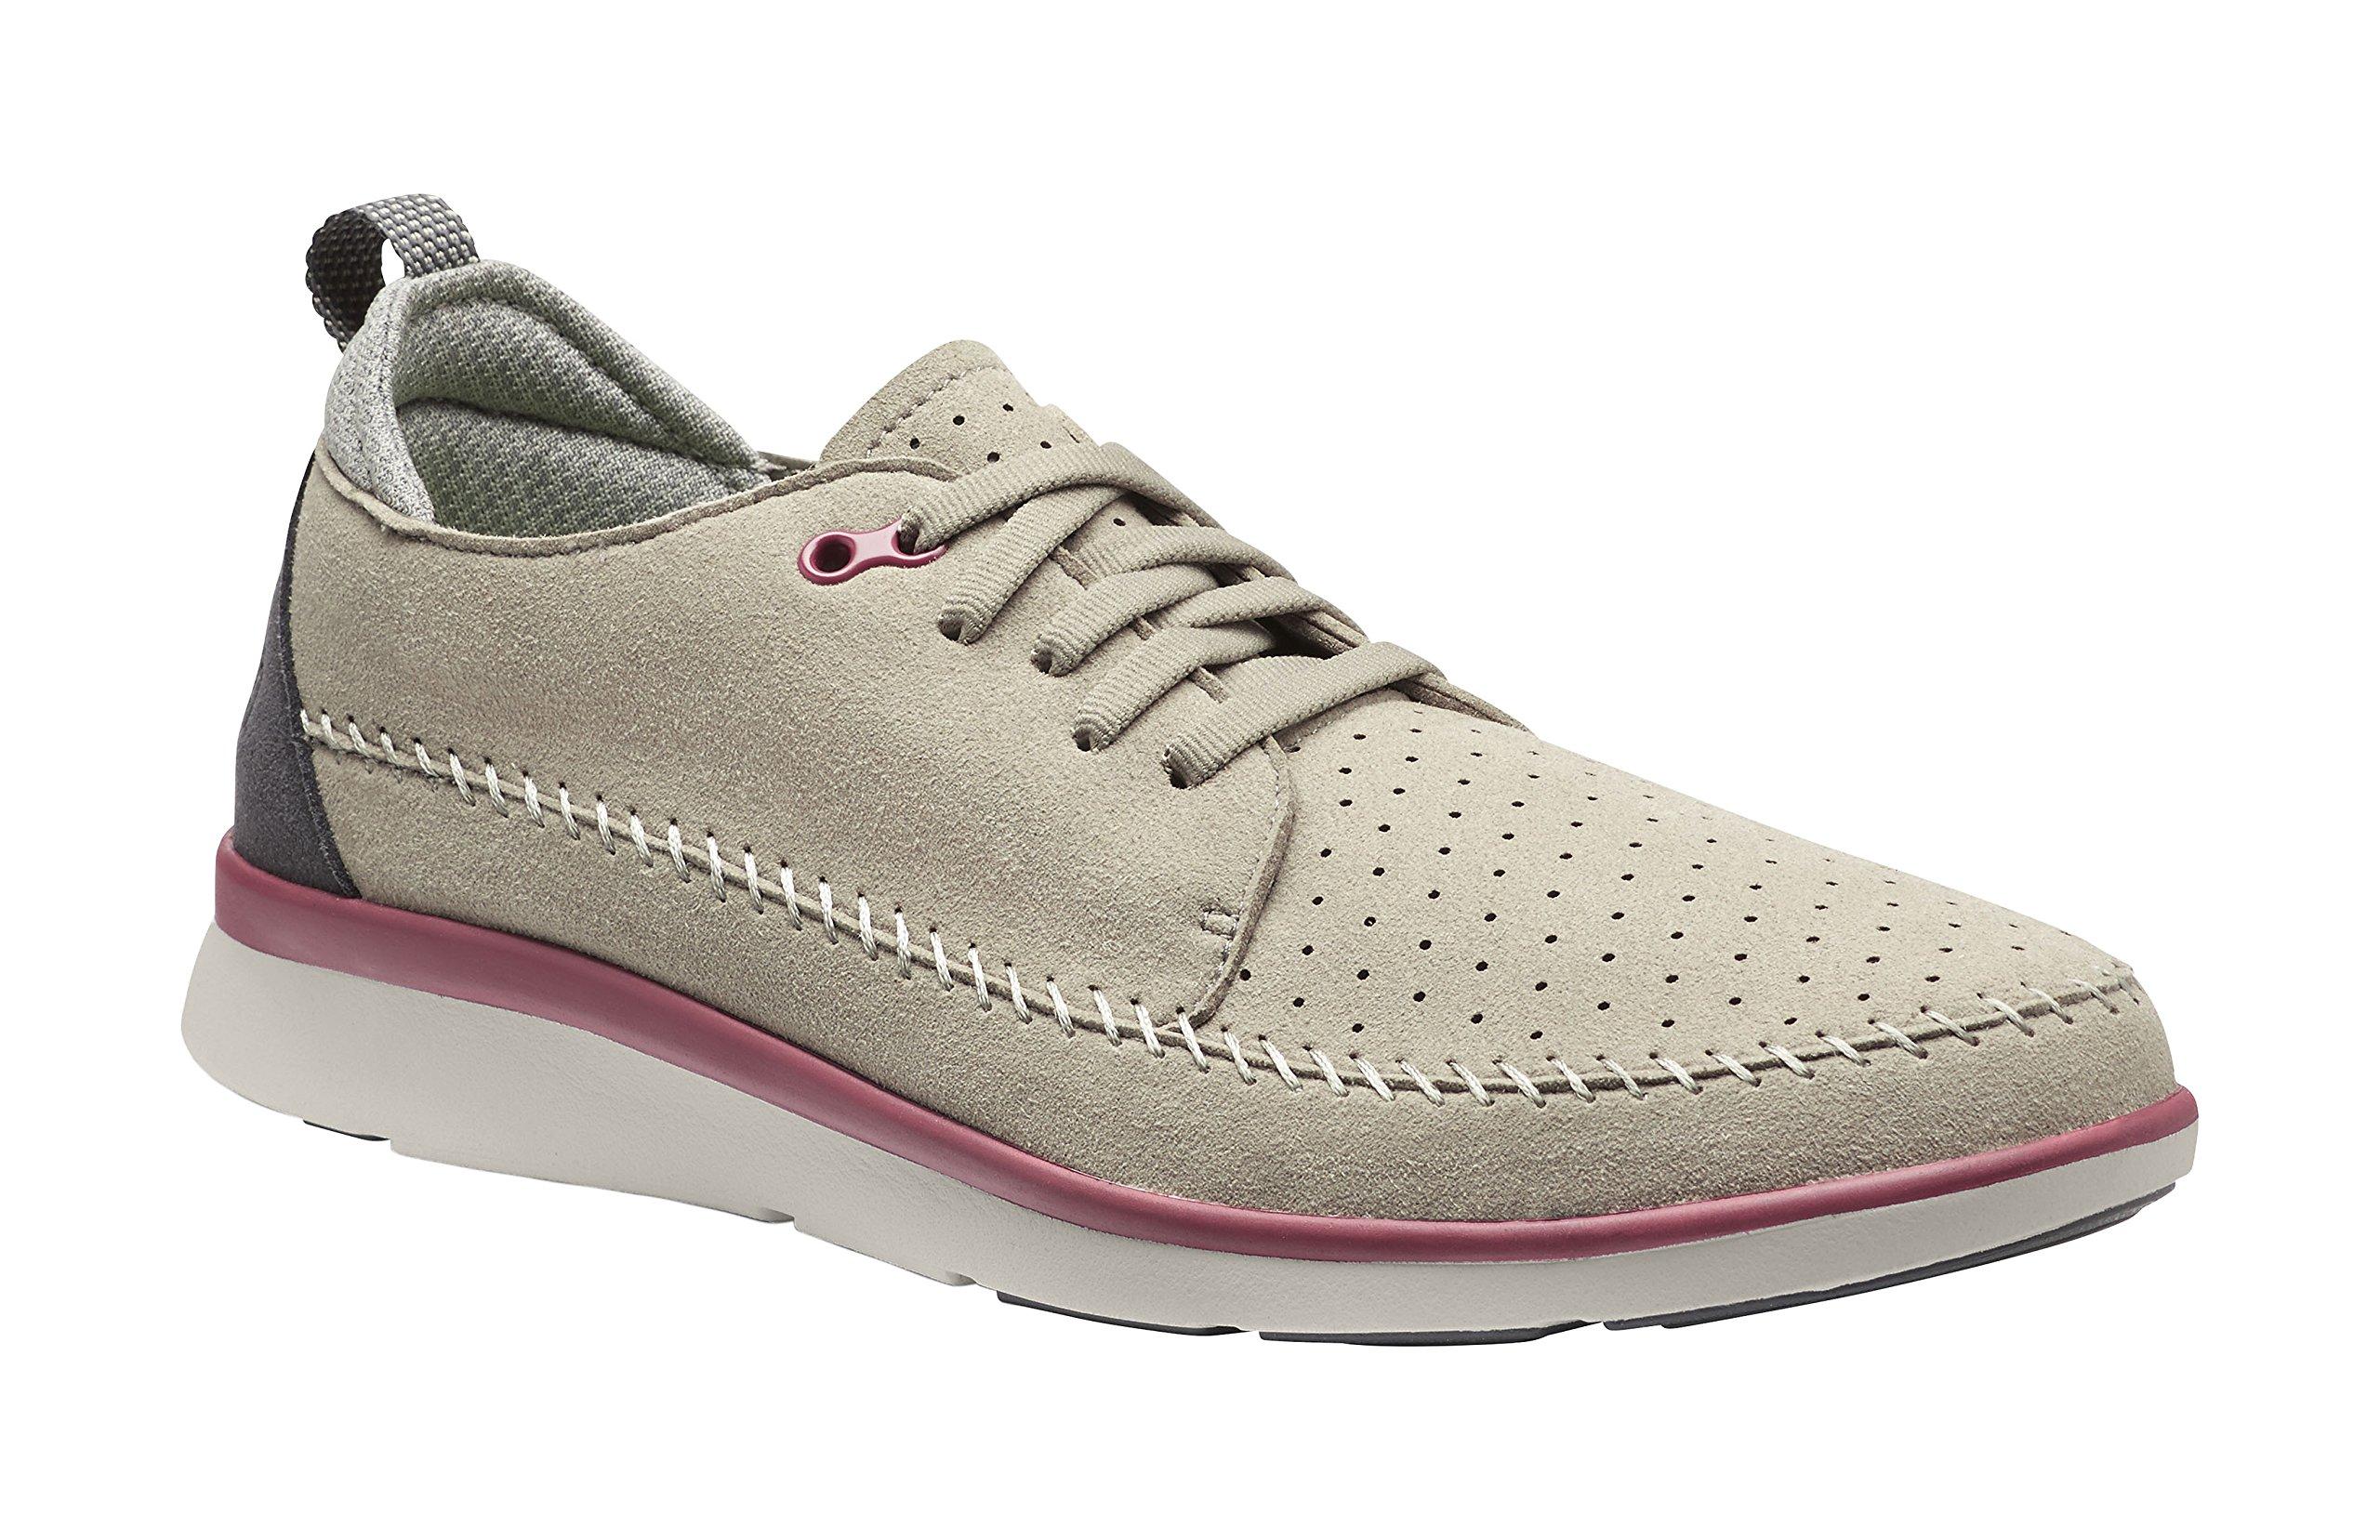 Superfeet Crane Men's Crafted Sport Shoe, Cobblestone/Moonbeam, Microfiber, Men's 9.5 US